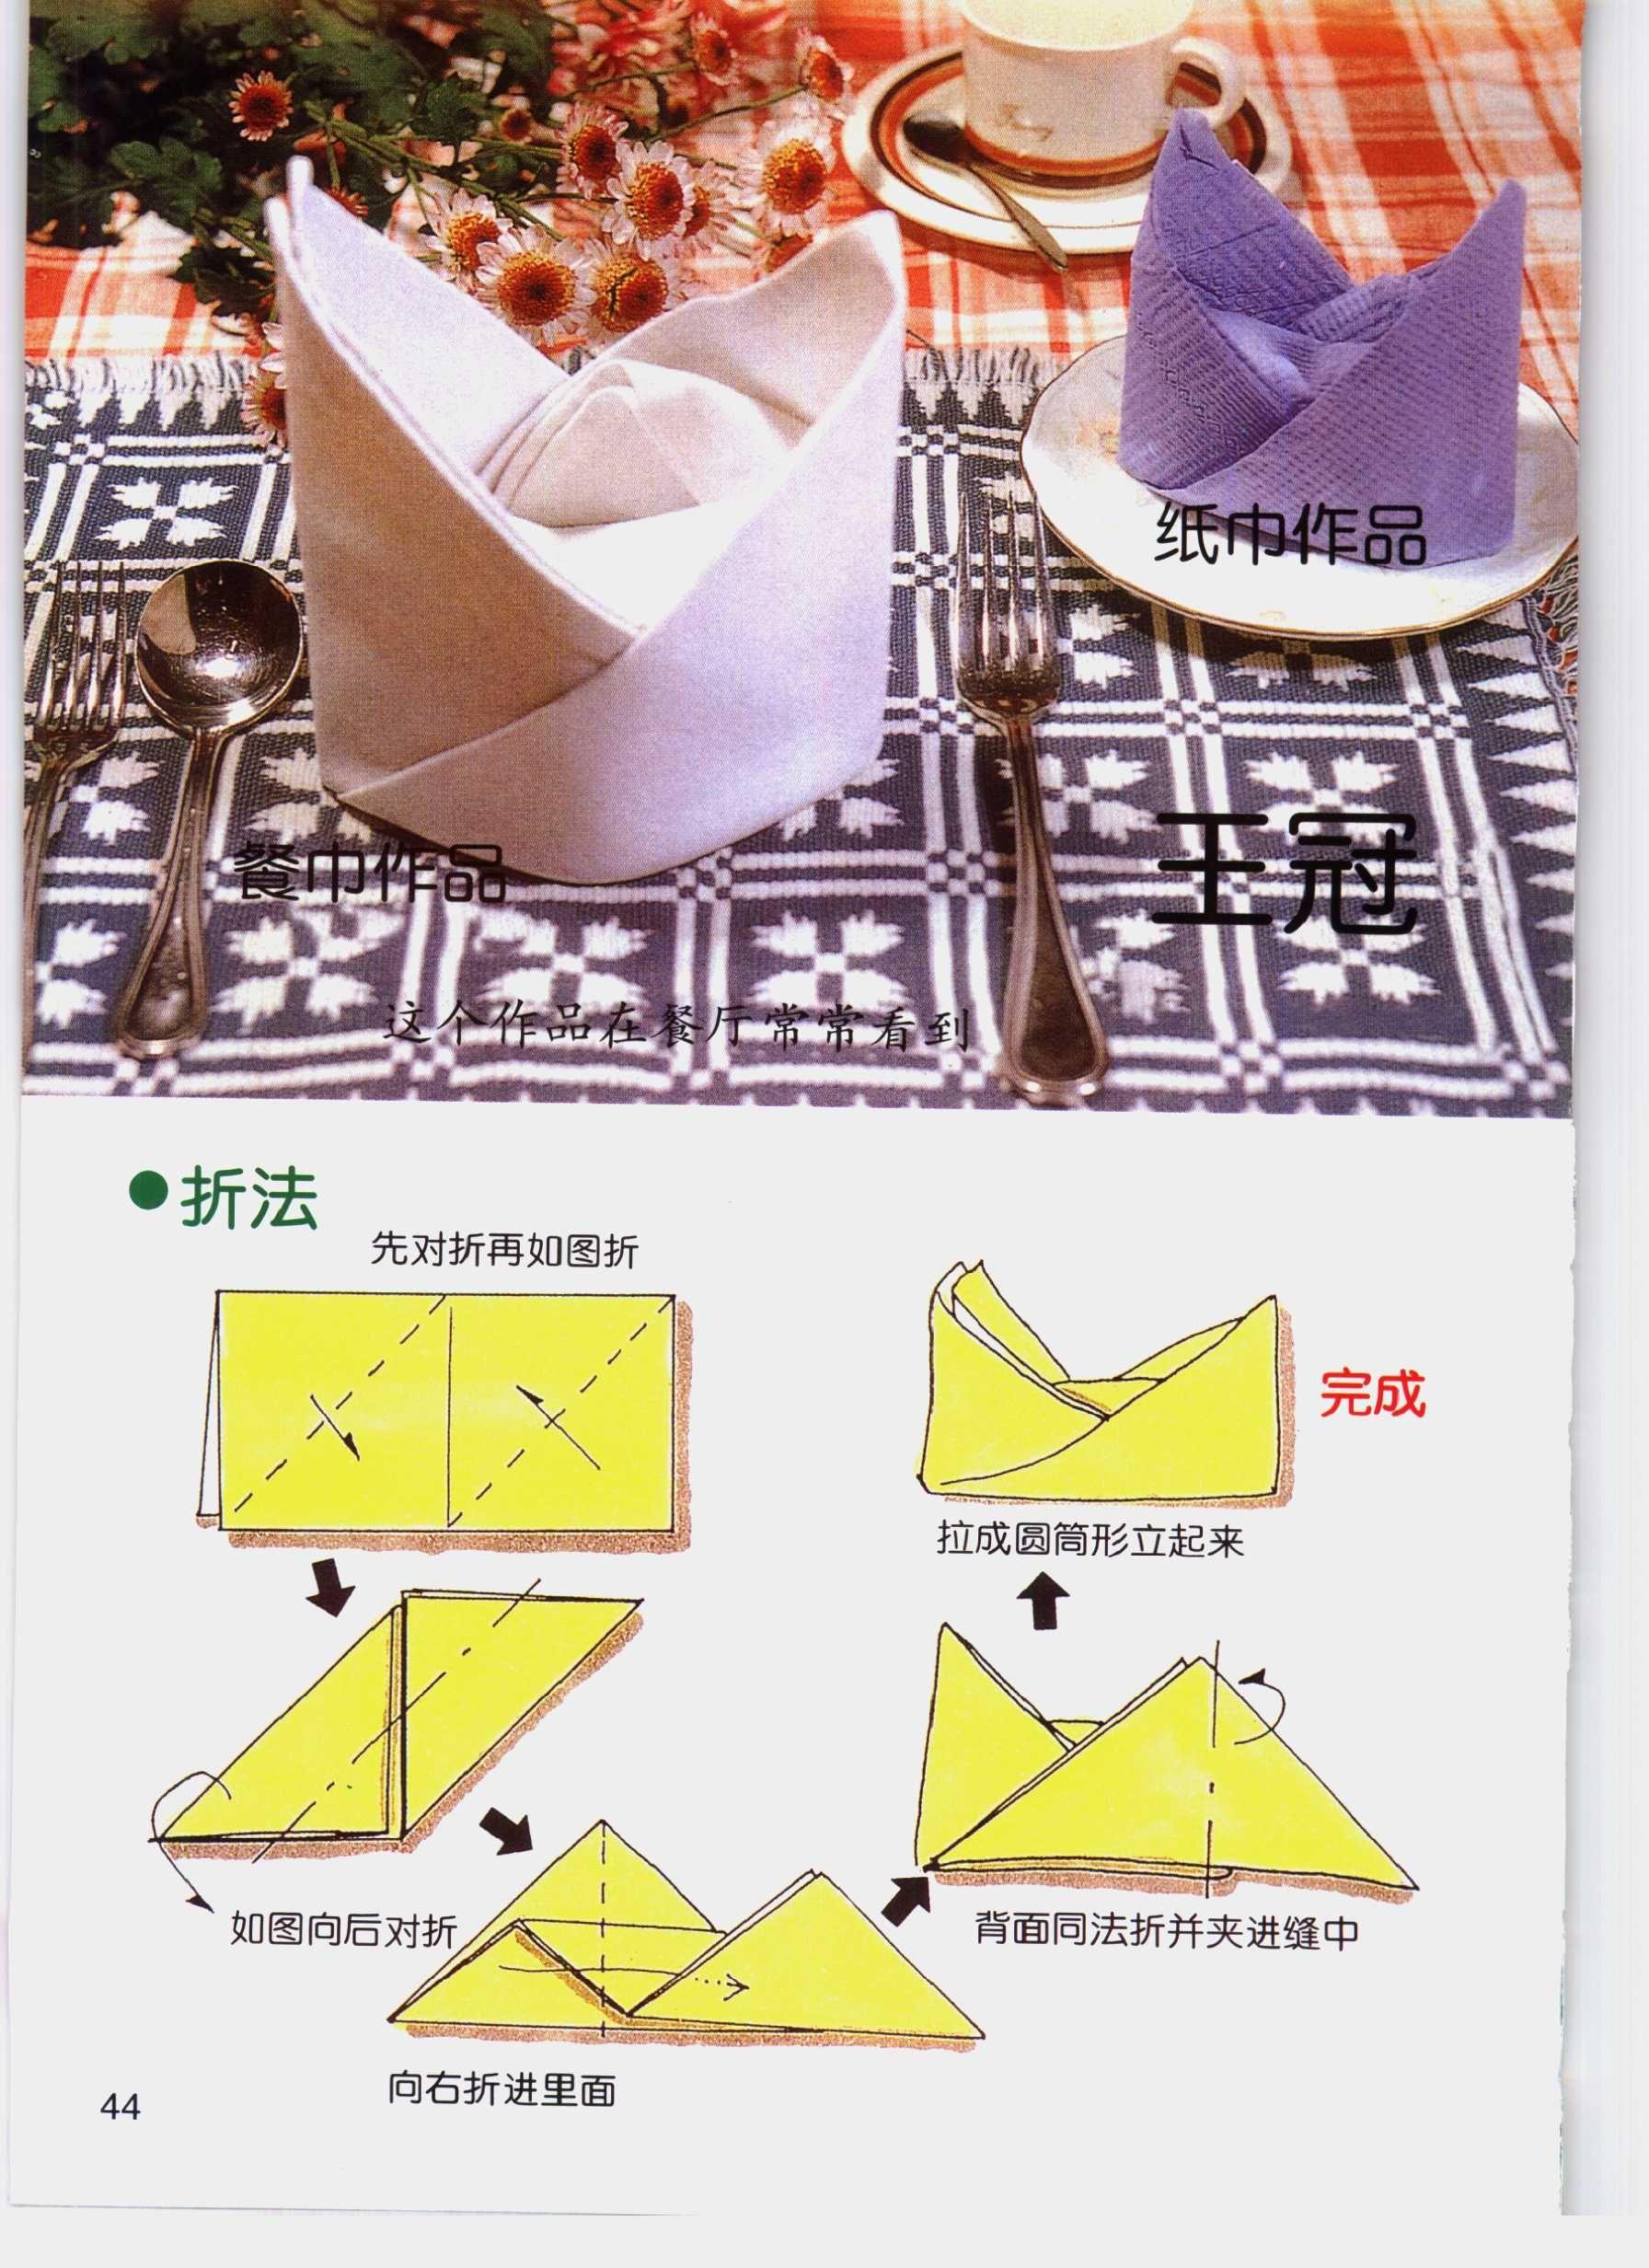 How To Fold A Fancy Napkin Diy Fold Napkins Crown Creative Napkins Napkin Folding Diy Napkins